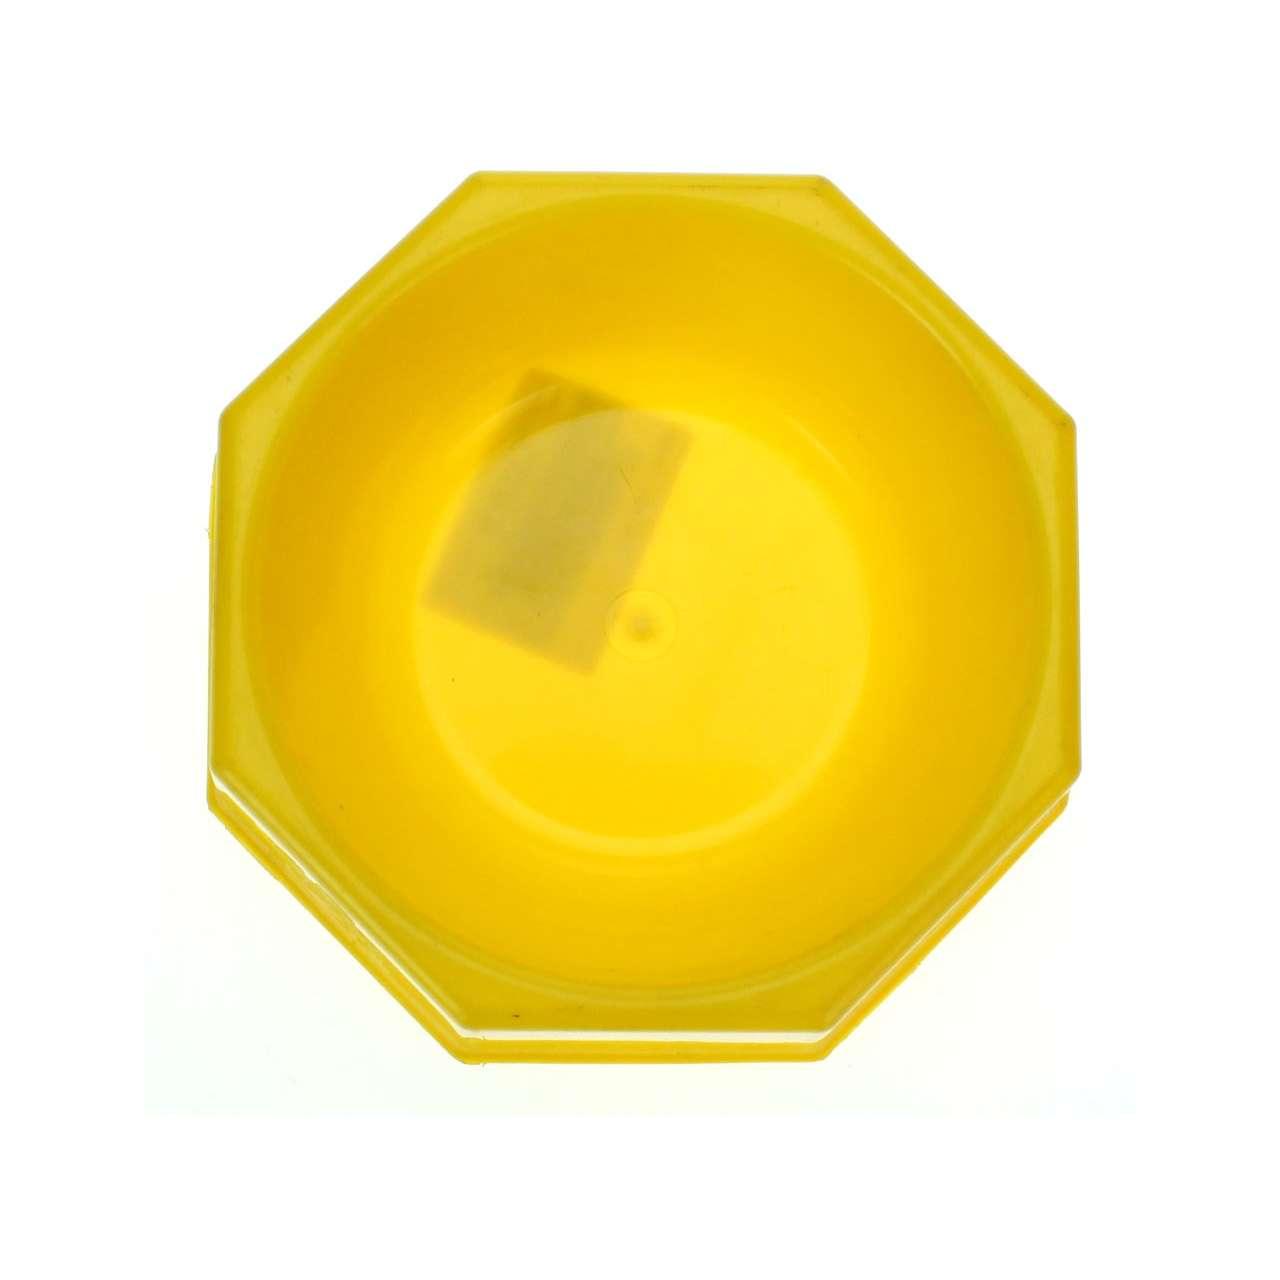 Comedouro Lider Zooplast Grande 1600ML - Cores Variadas